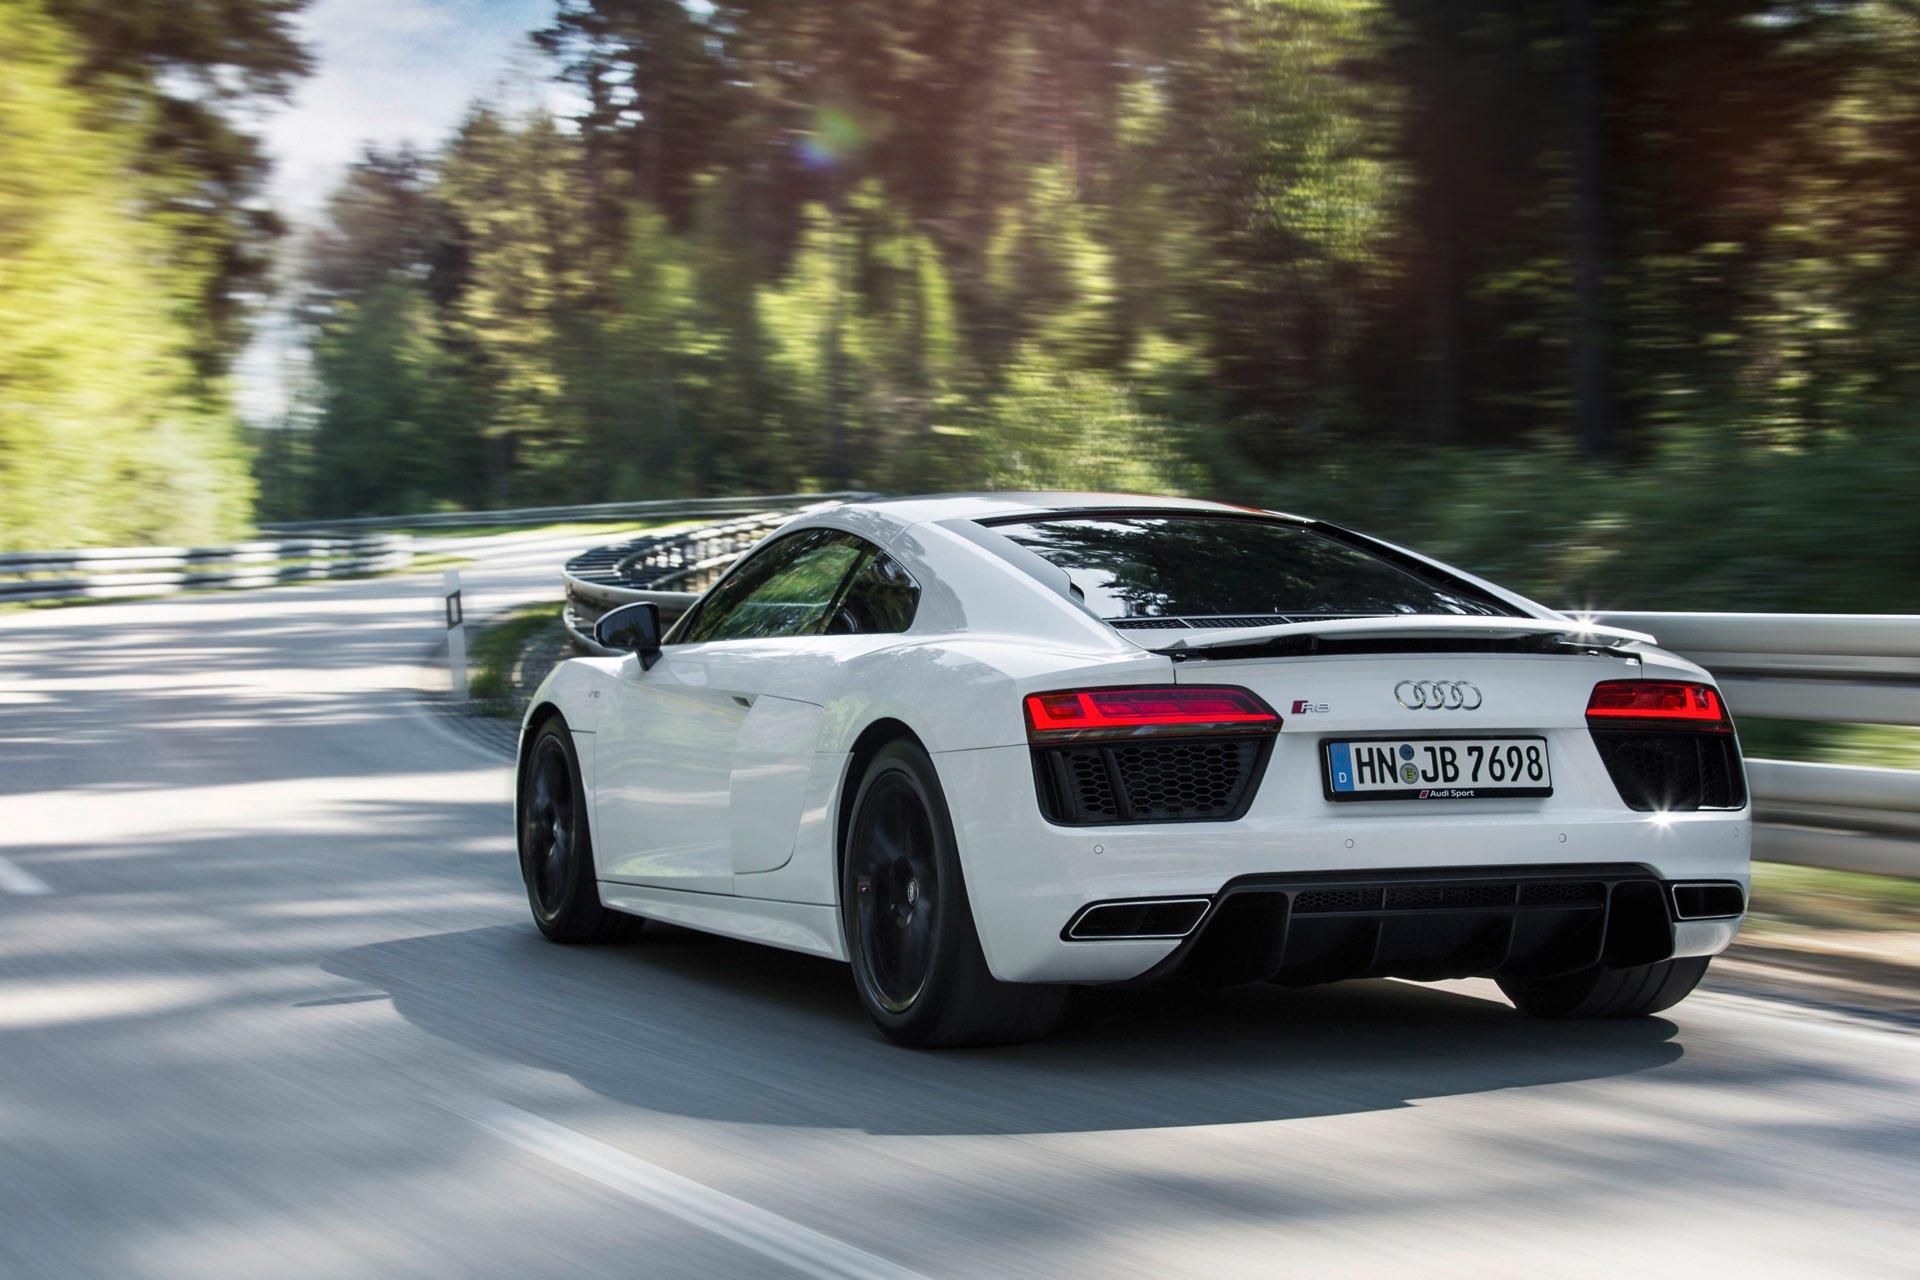 Official: Audi R8 V10 RWS - Limited to 999 - GTspirit